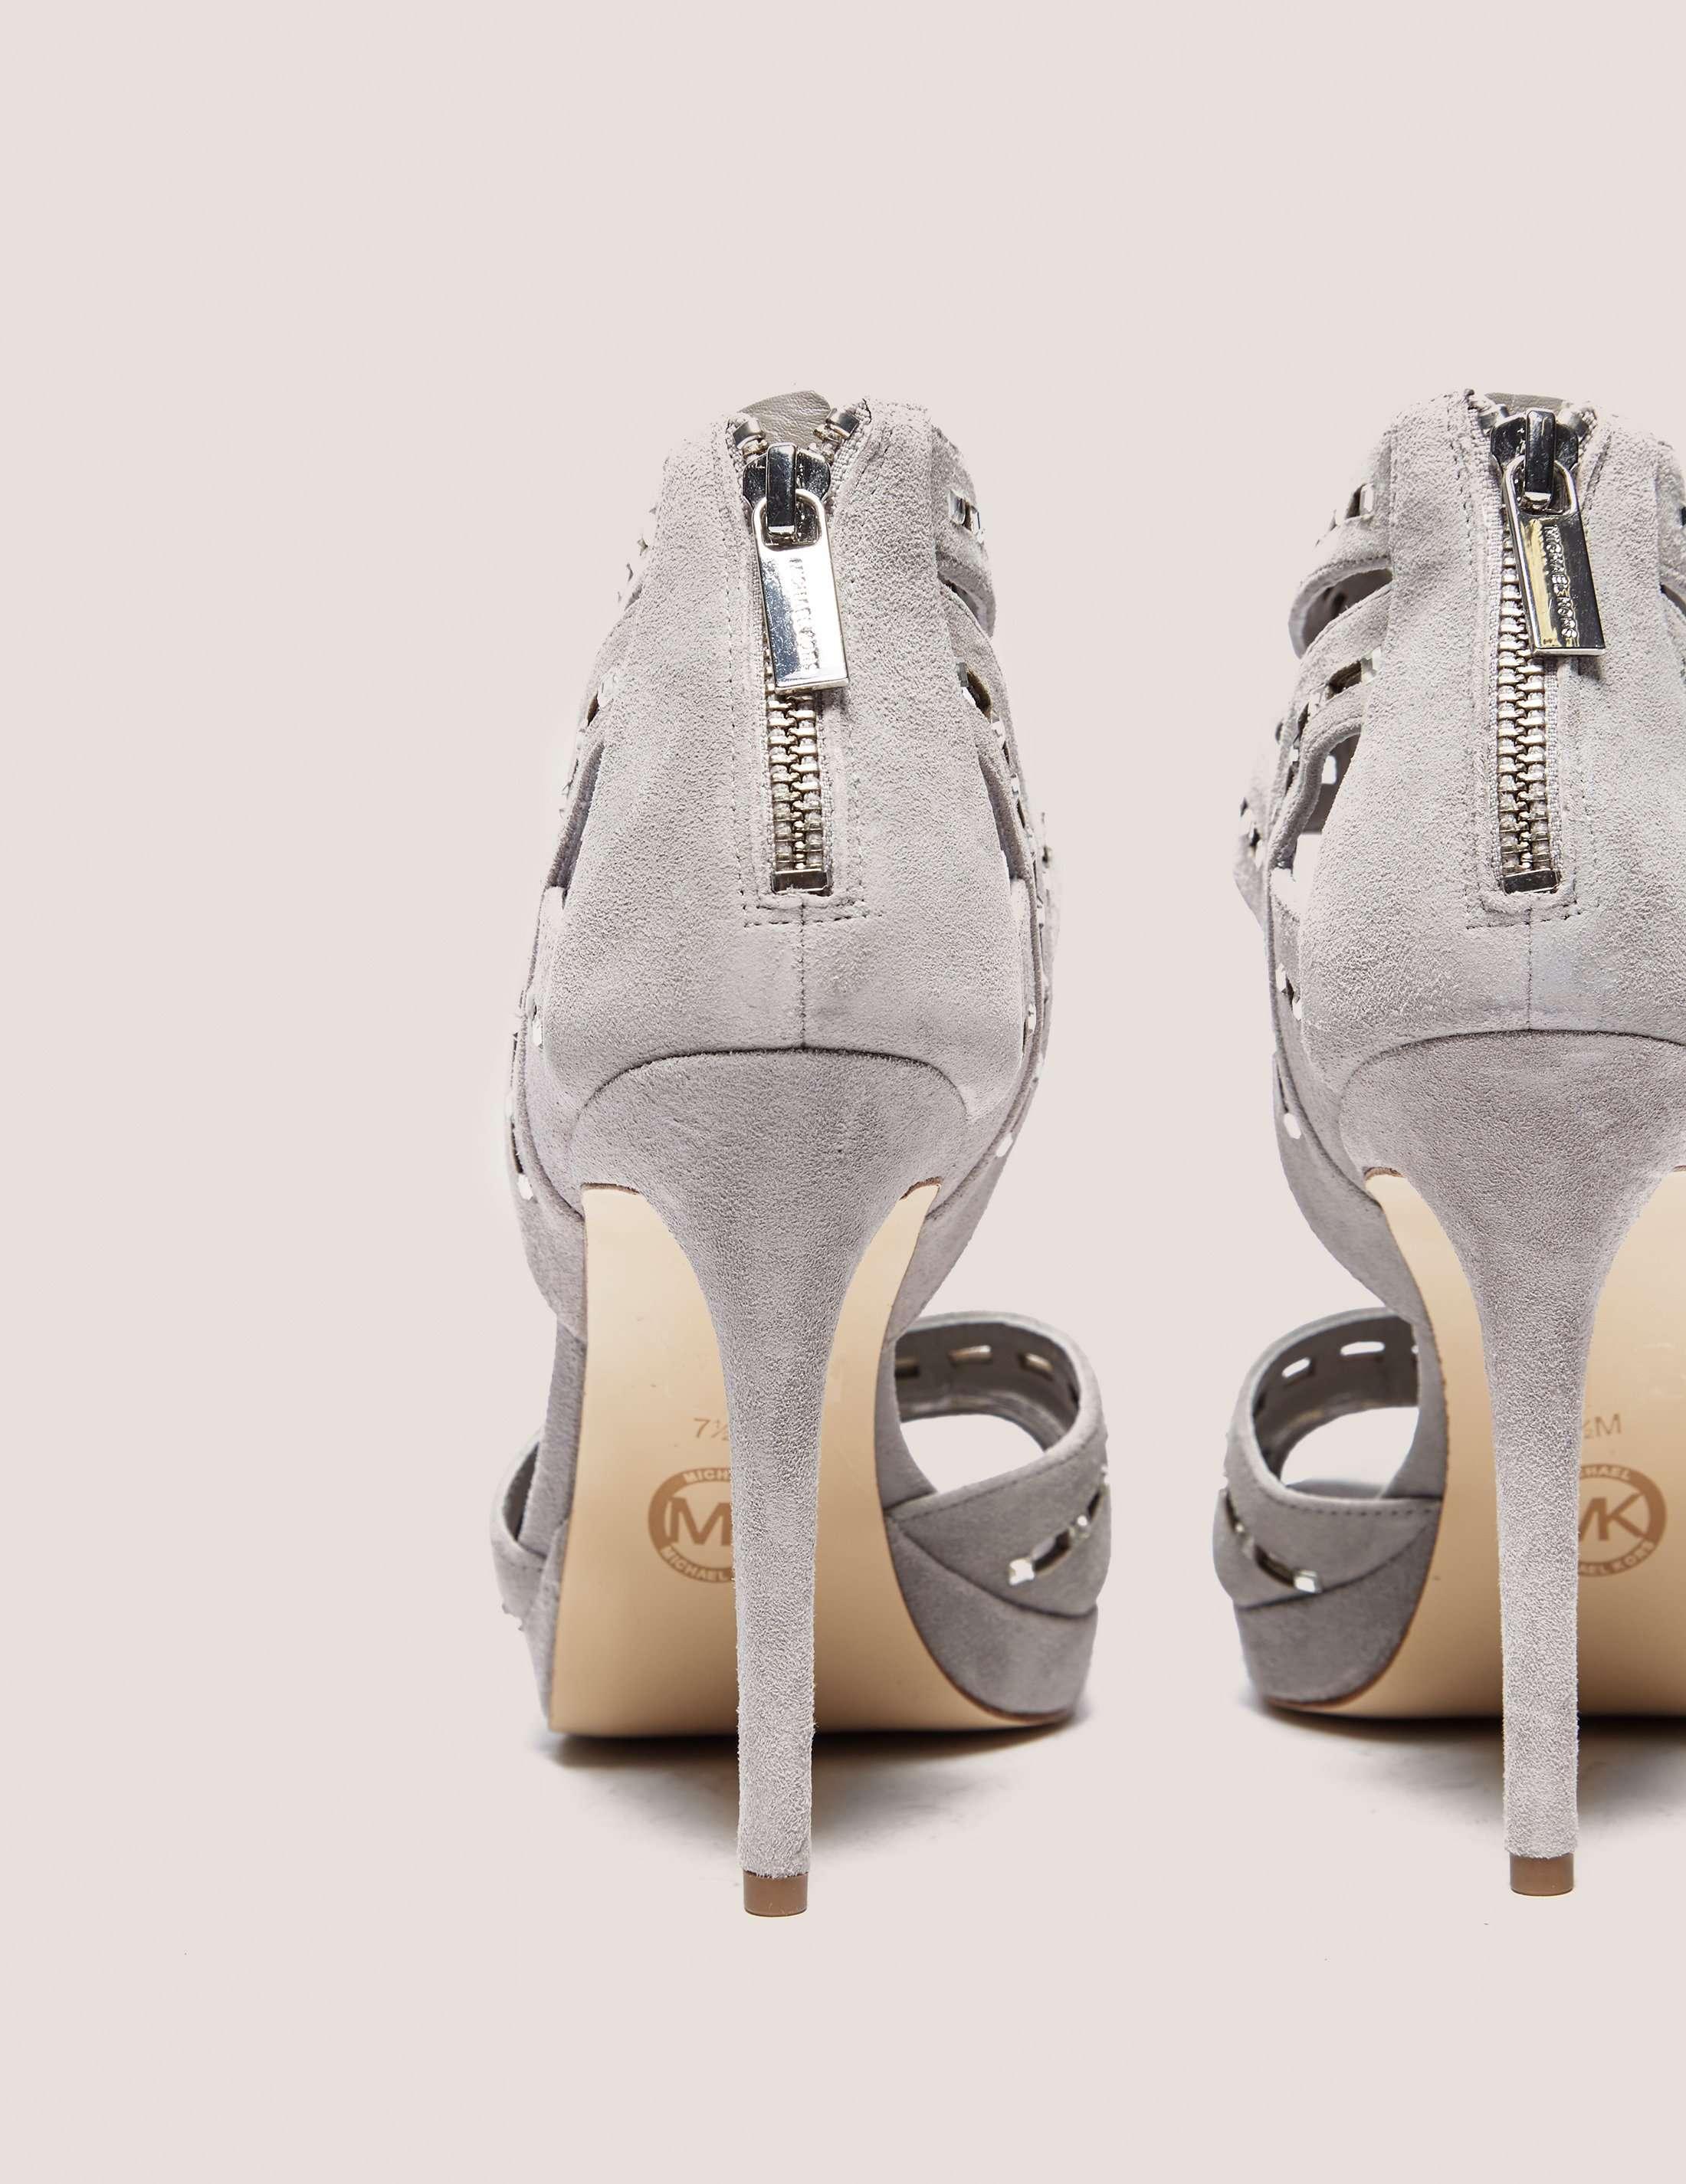 Michael Kors Honey Sandals